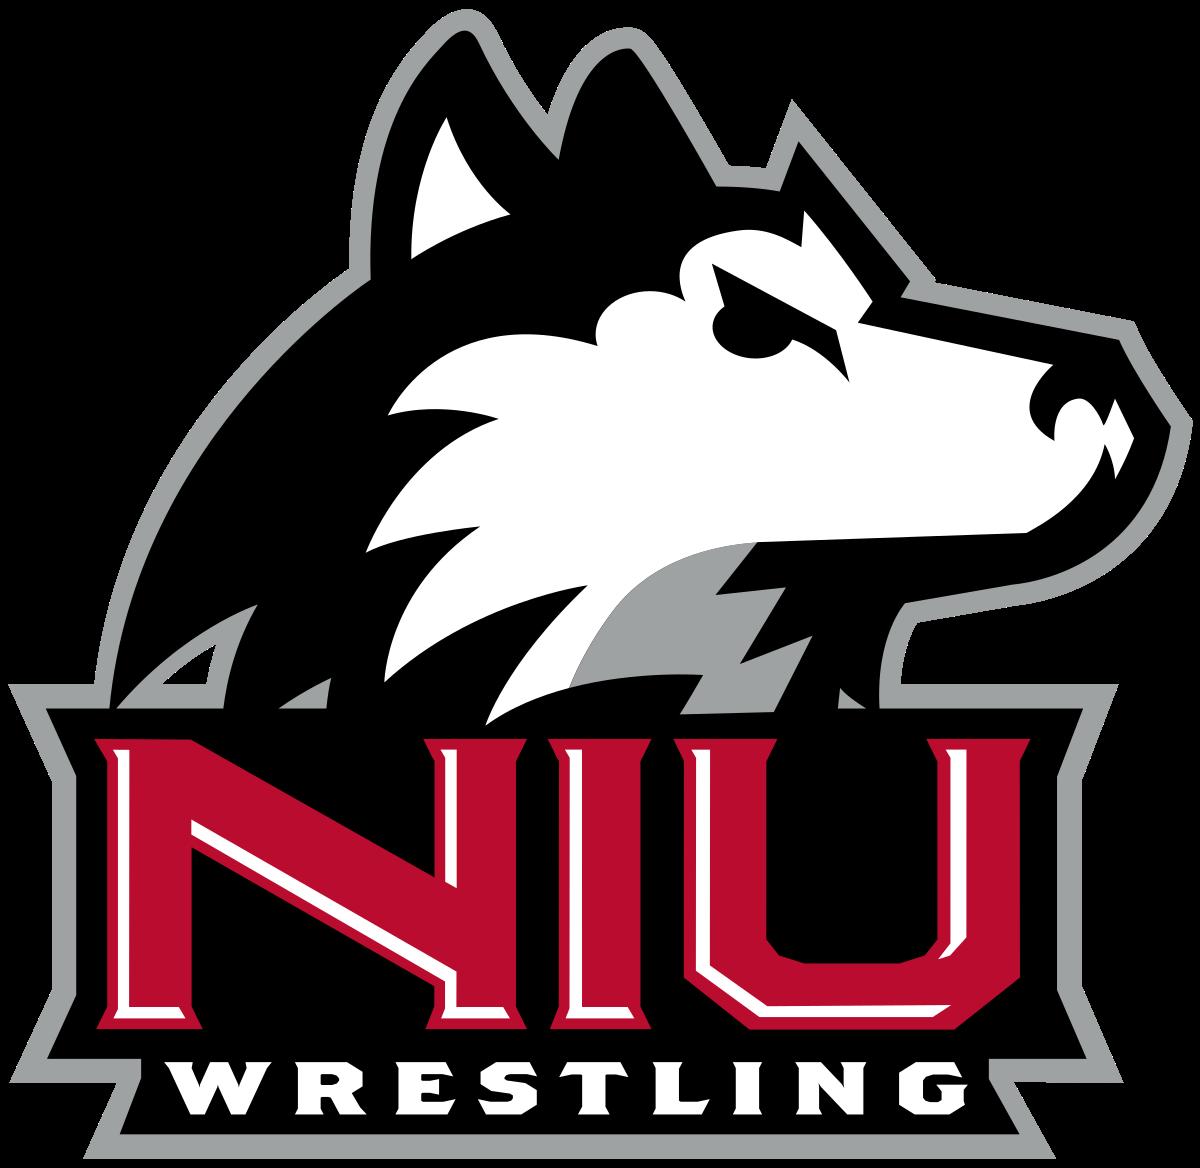 Northern illinois huskies wikipedia. Wrestlers clipart wrestling coach